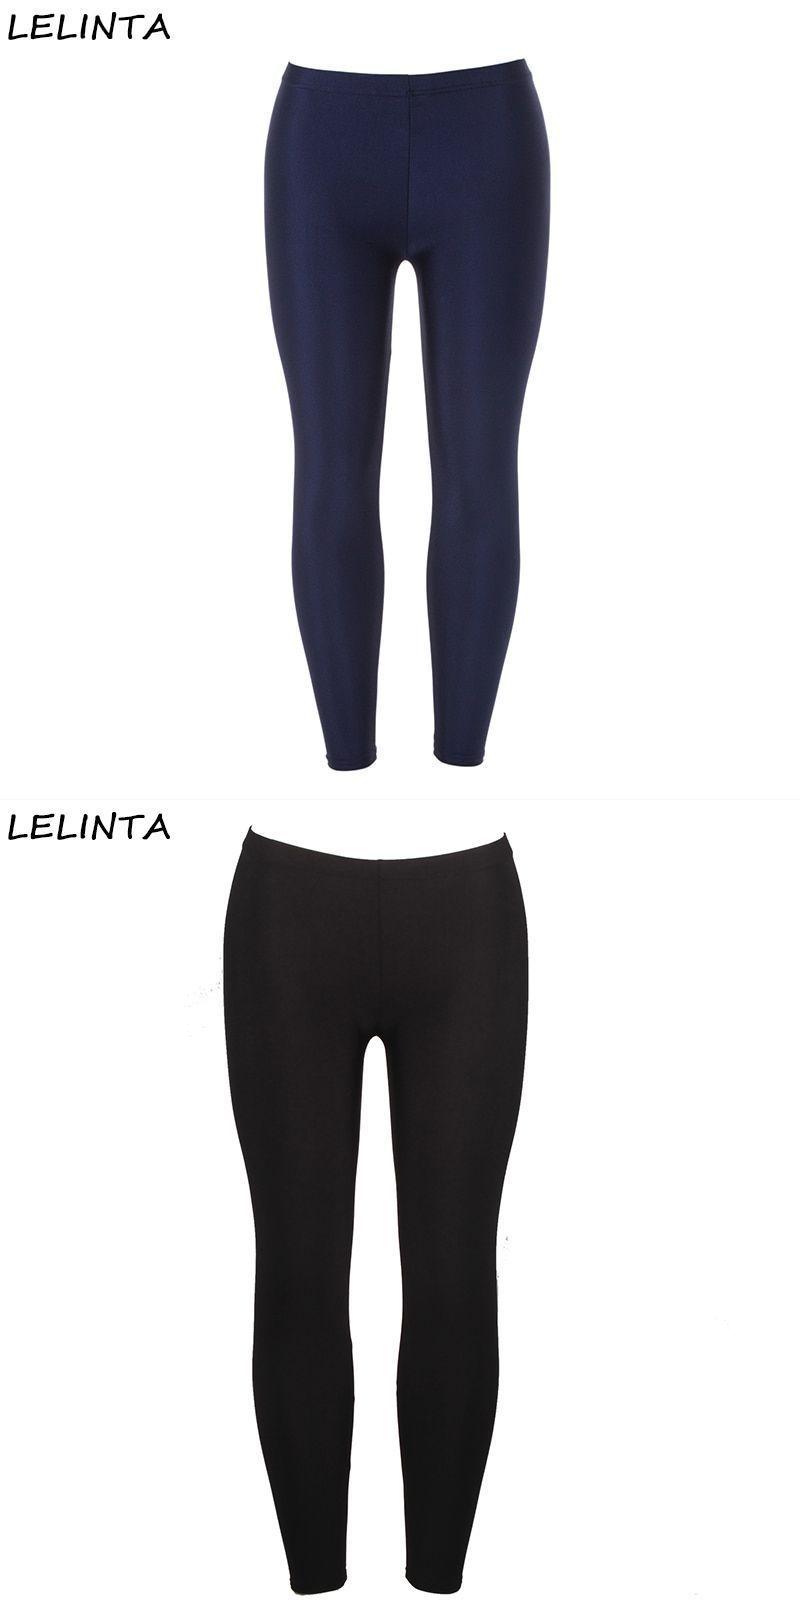 c60e54a30f5b5 Women s black sportes pants high waist tummy control shapewear ankle  legging leggings woman pants elastic stretch pant  spandex